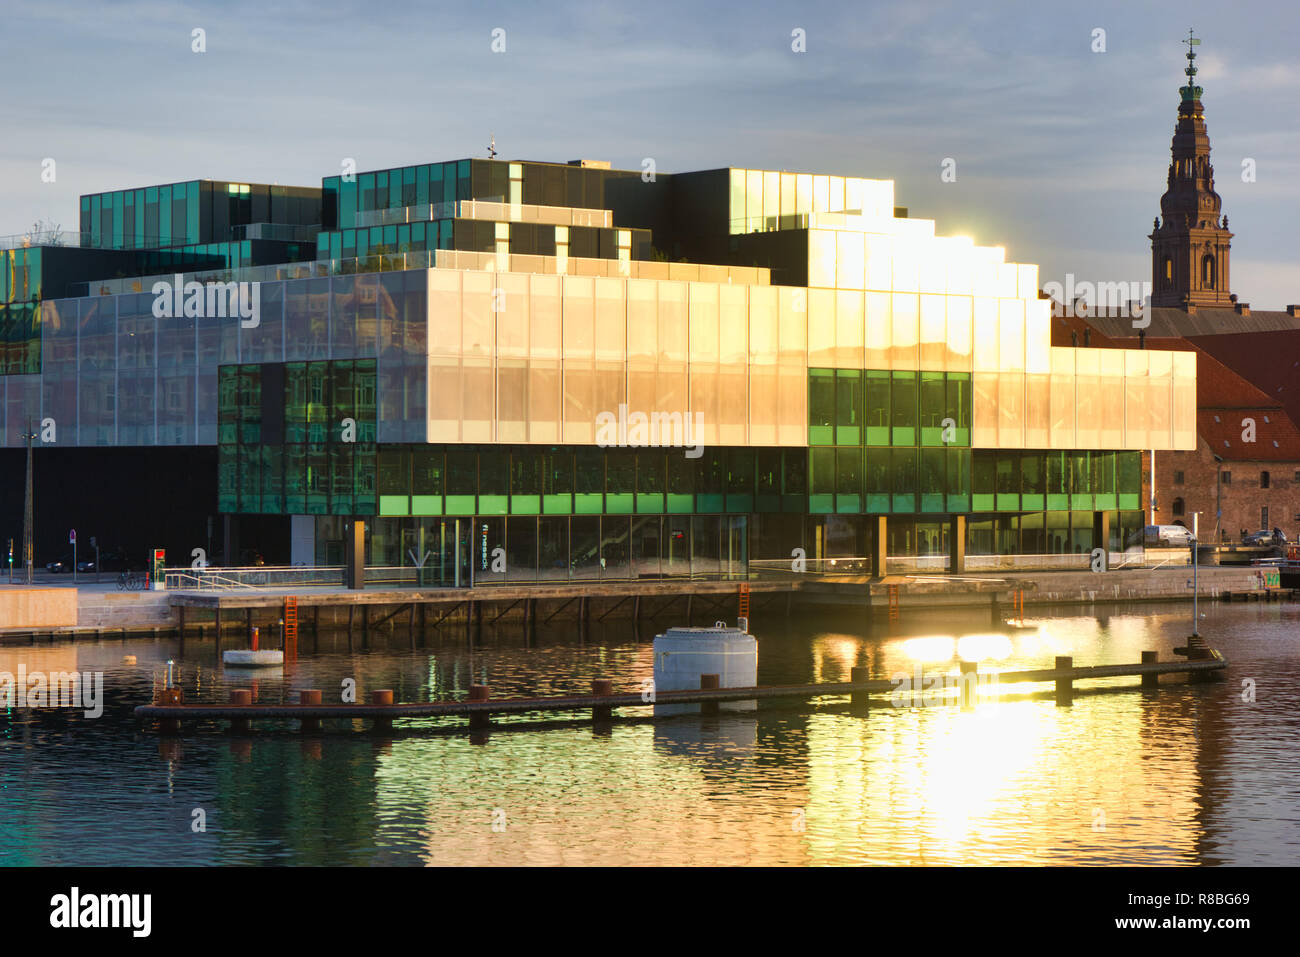 Danish Architecture Center (DAC) Copenhagen, Denmark, Scandinavia - Stock Image